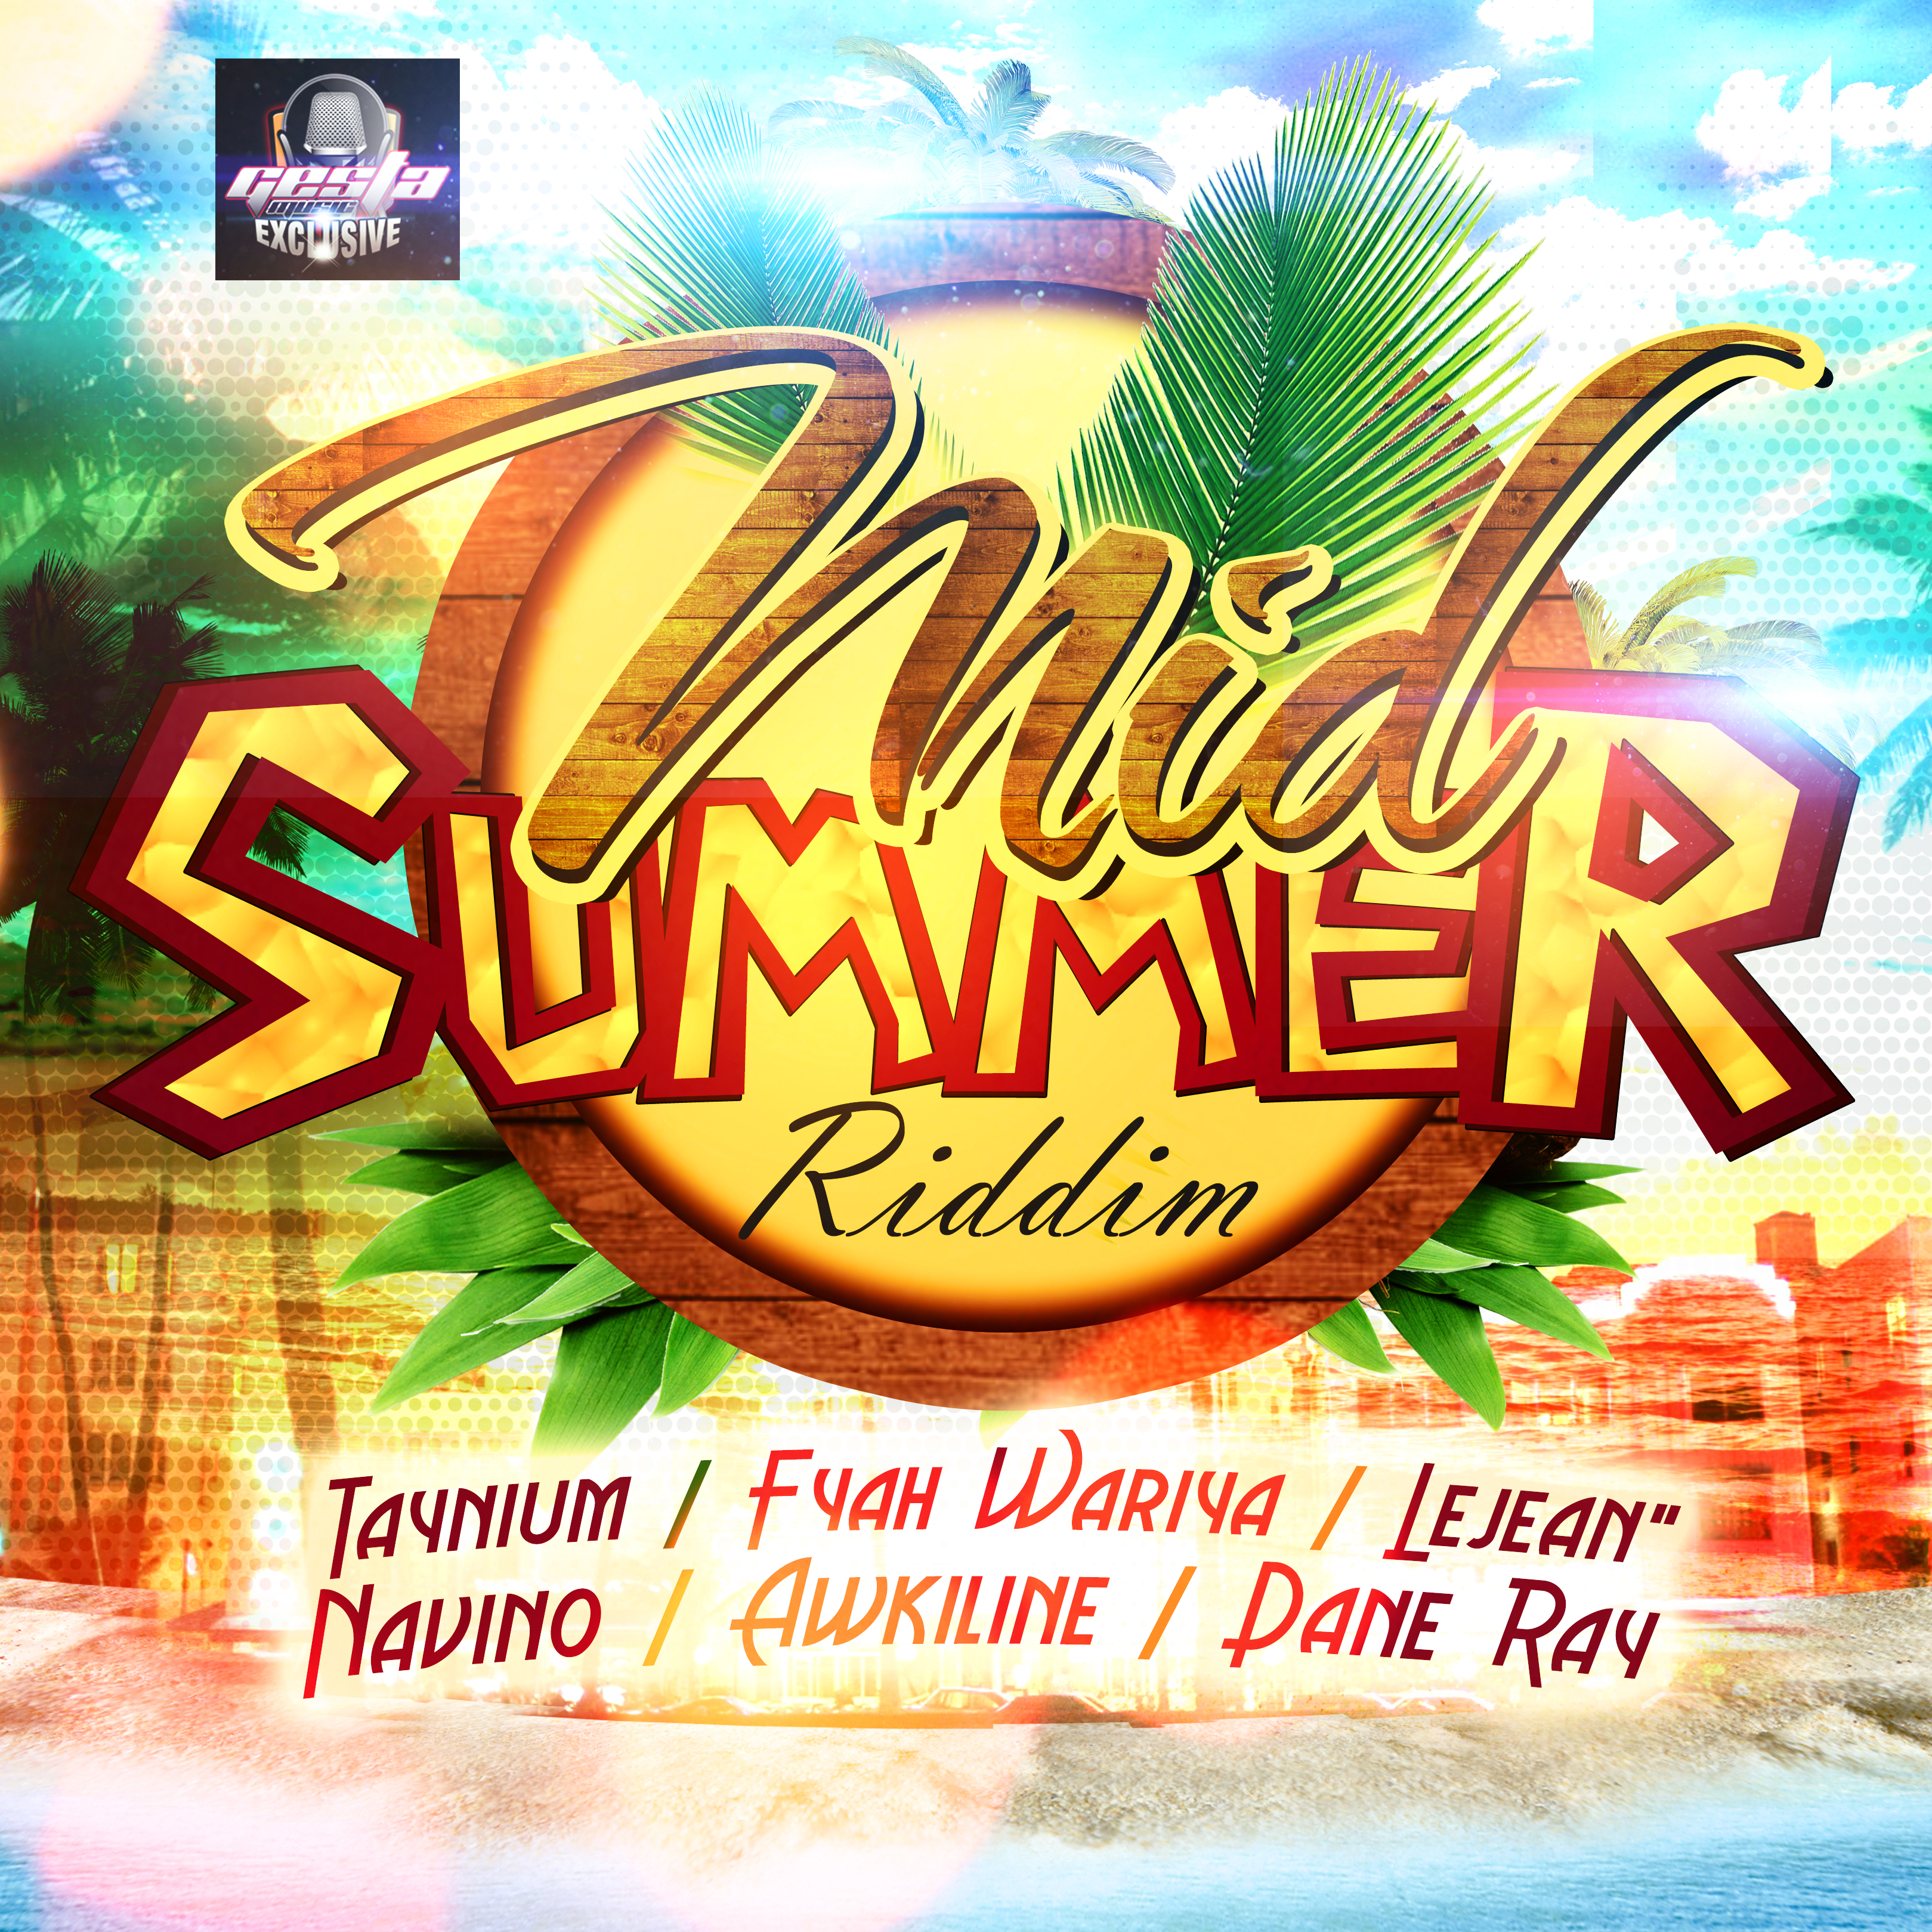 MID-SUMMER-RIDDIM-GESTA-MUSIC-COVER